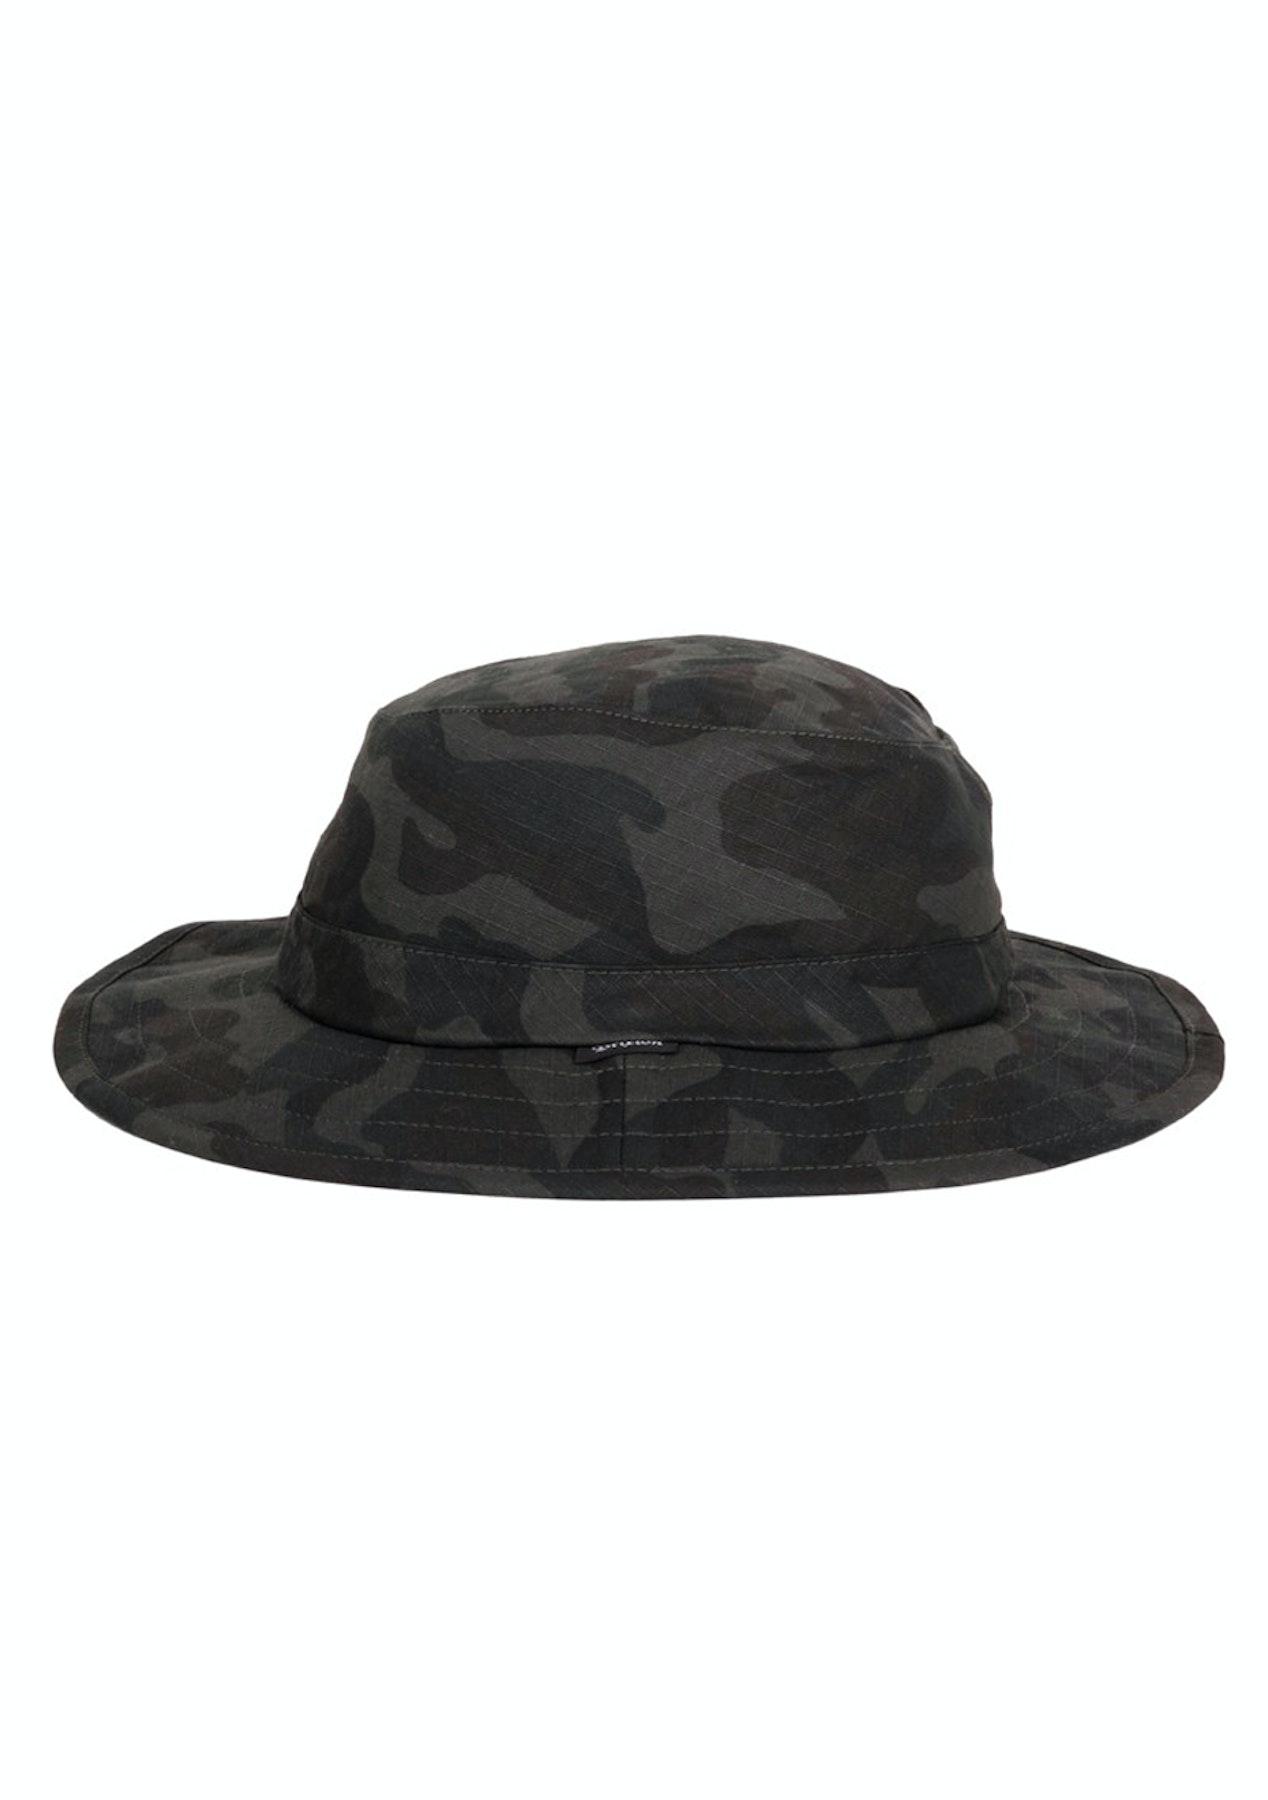 1cb8cd40579 Brixton - Tracker Bucket Hat - Grey - Mens Streetwear Sale - Onceit